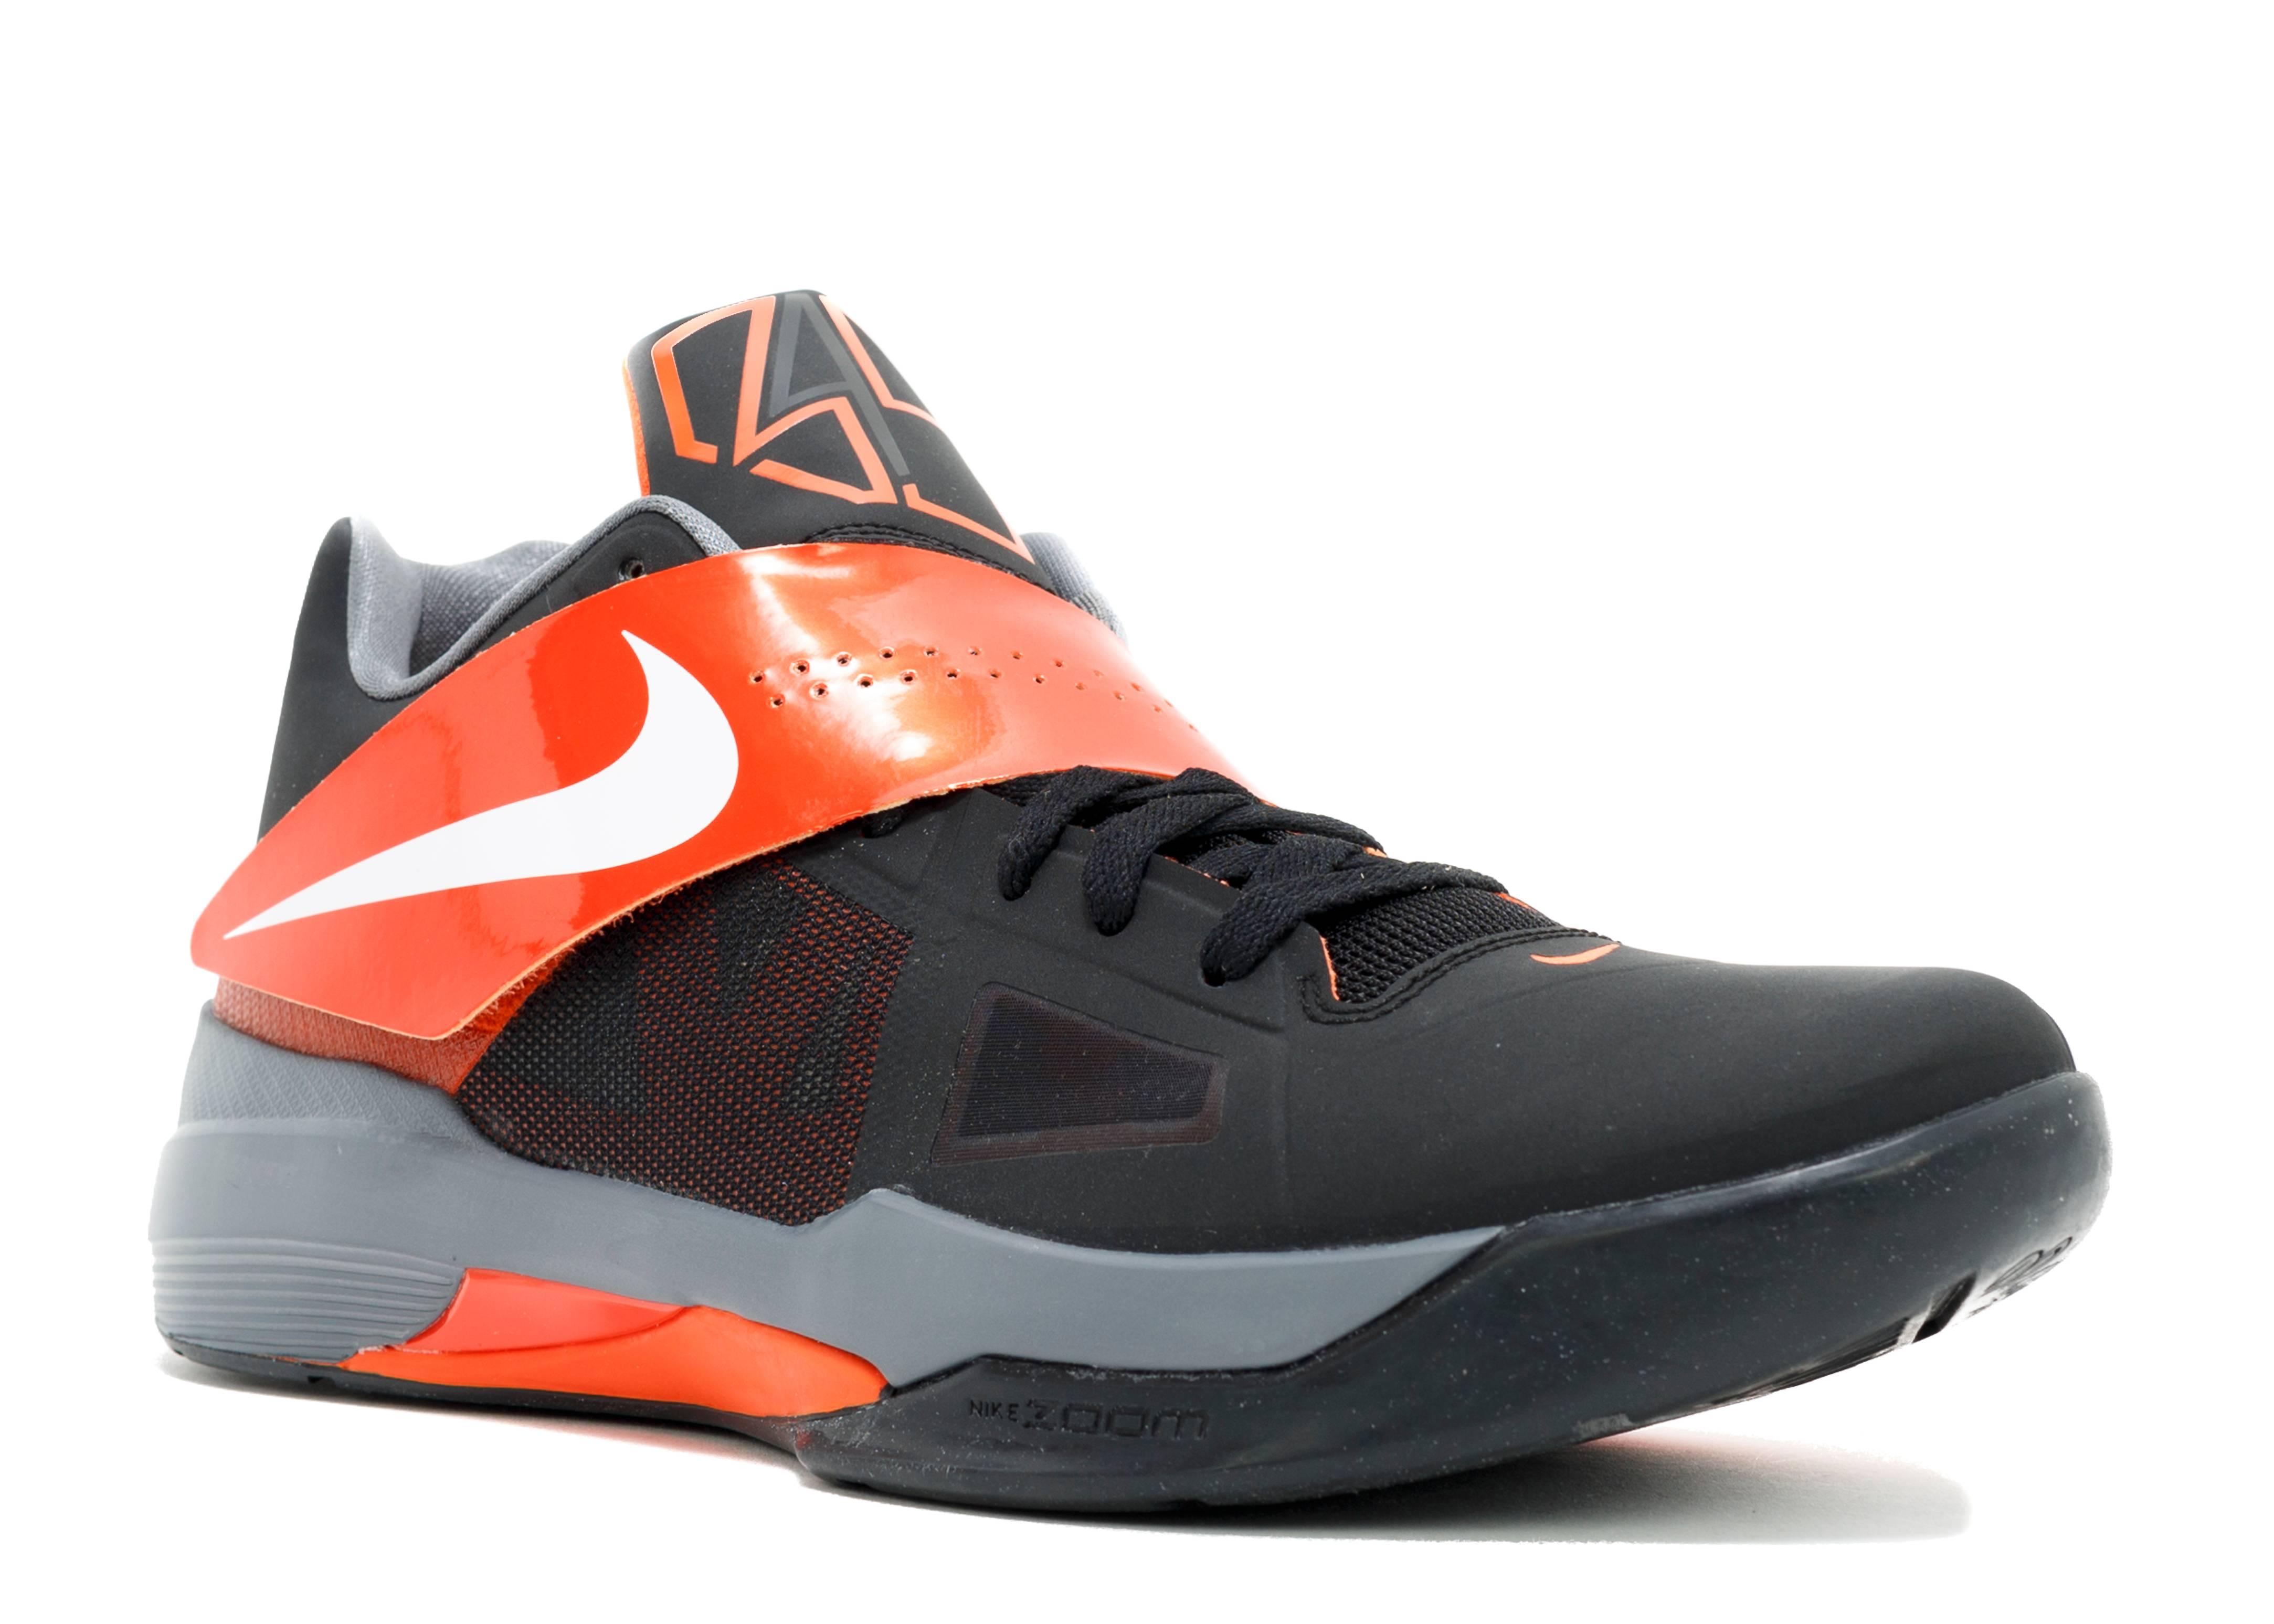 Kd 5 Black And Orange